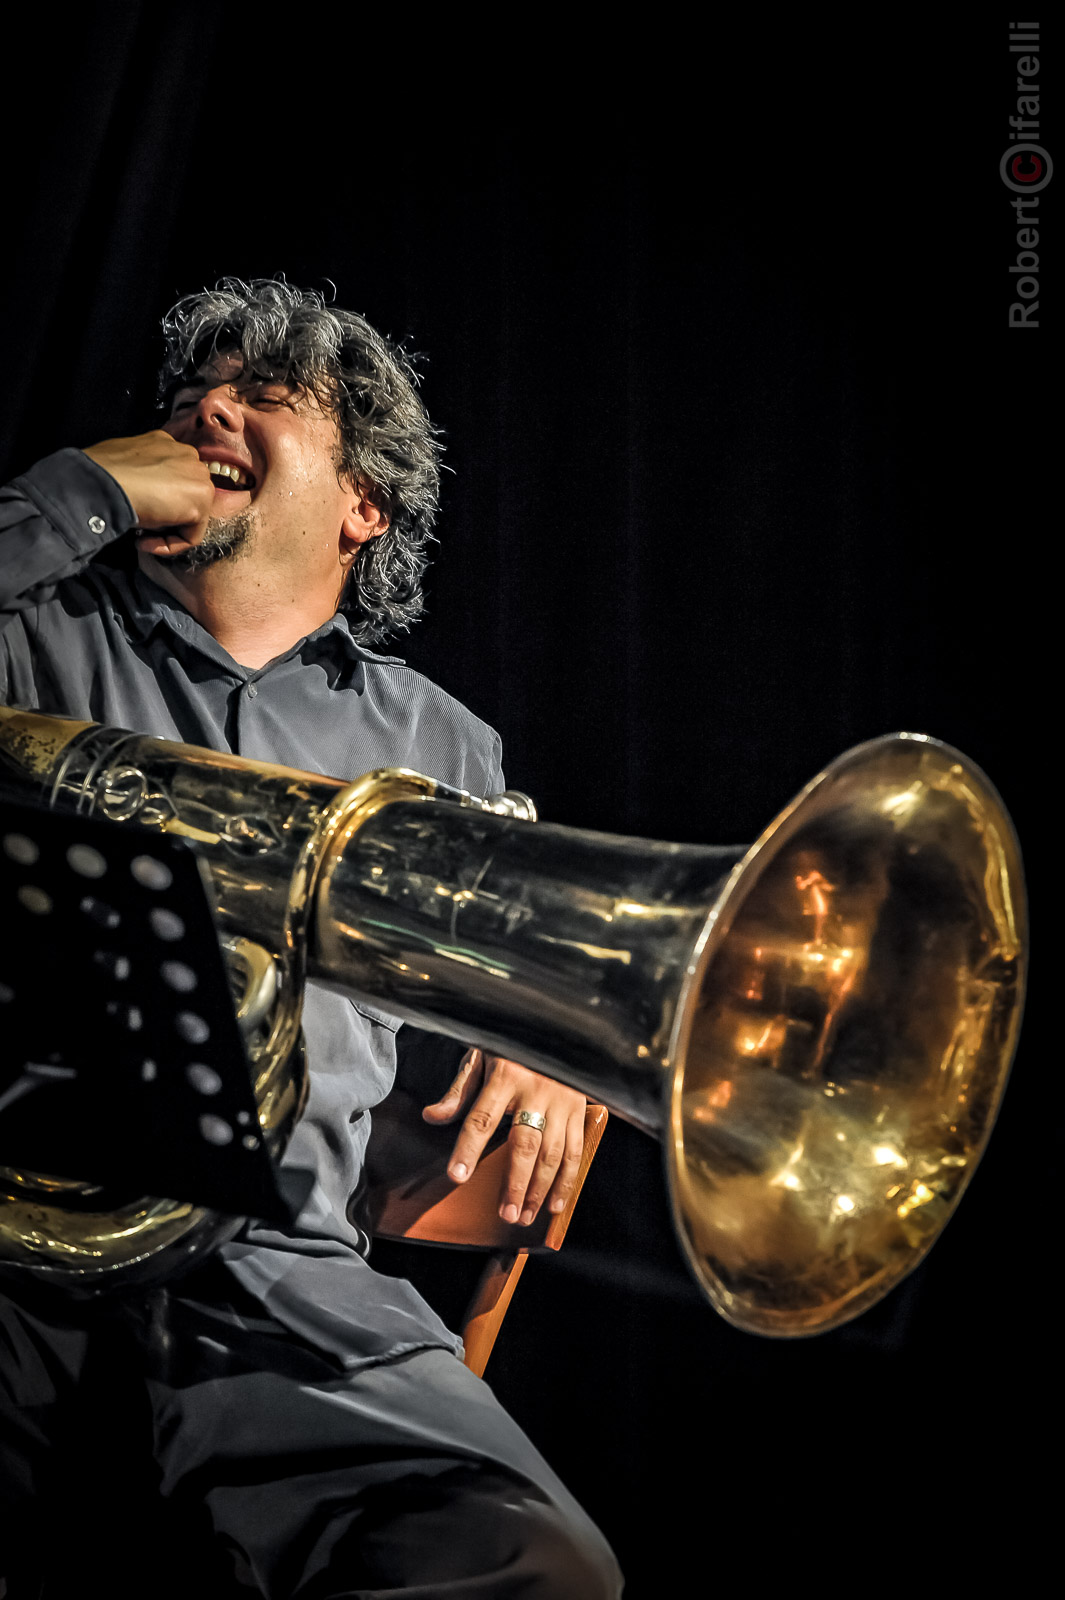 Marcus Rojas